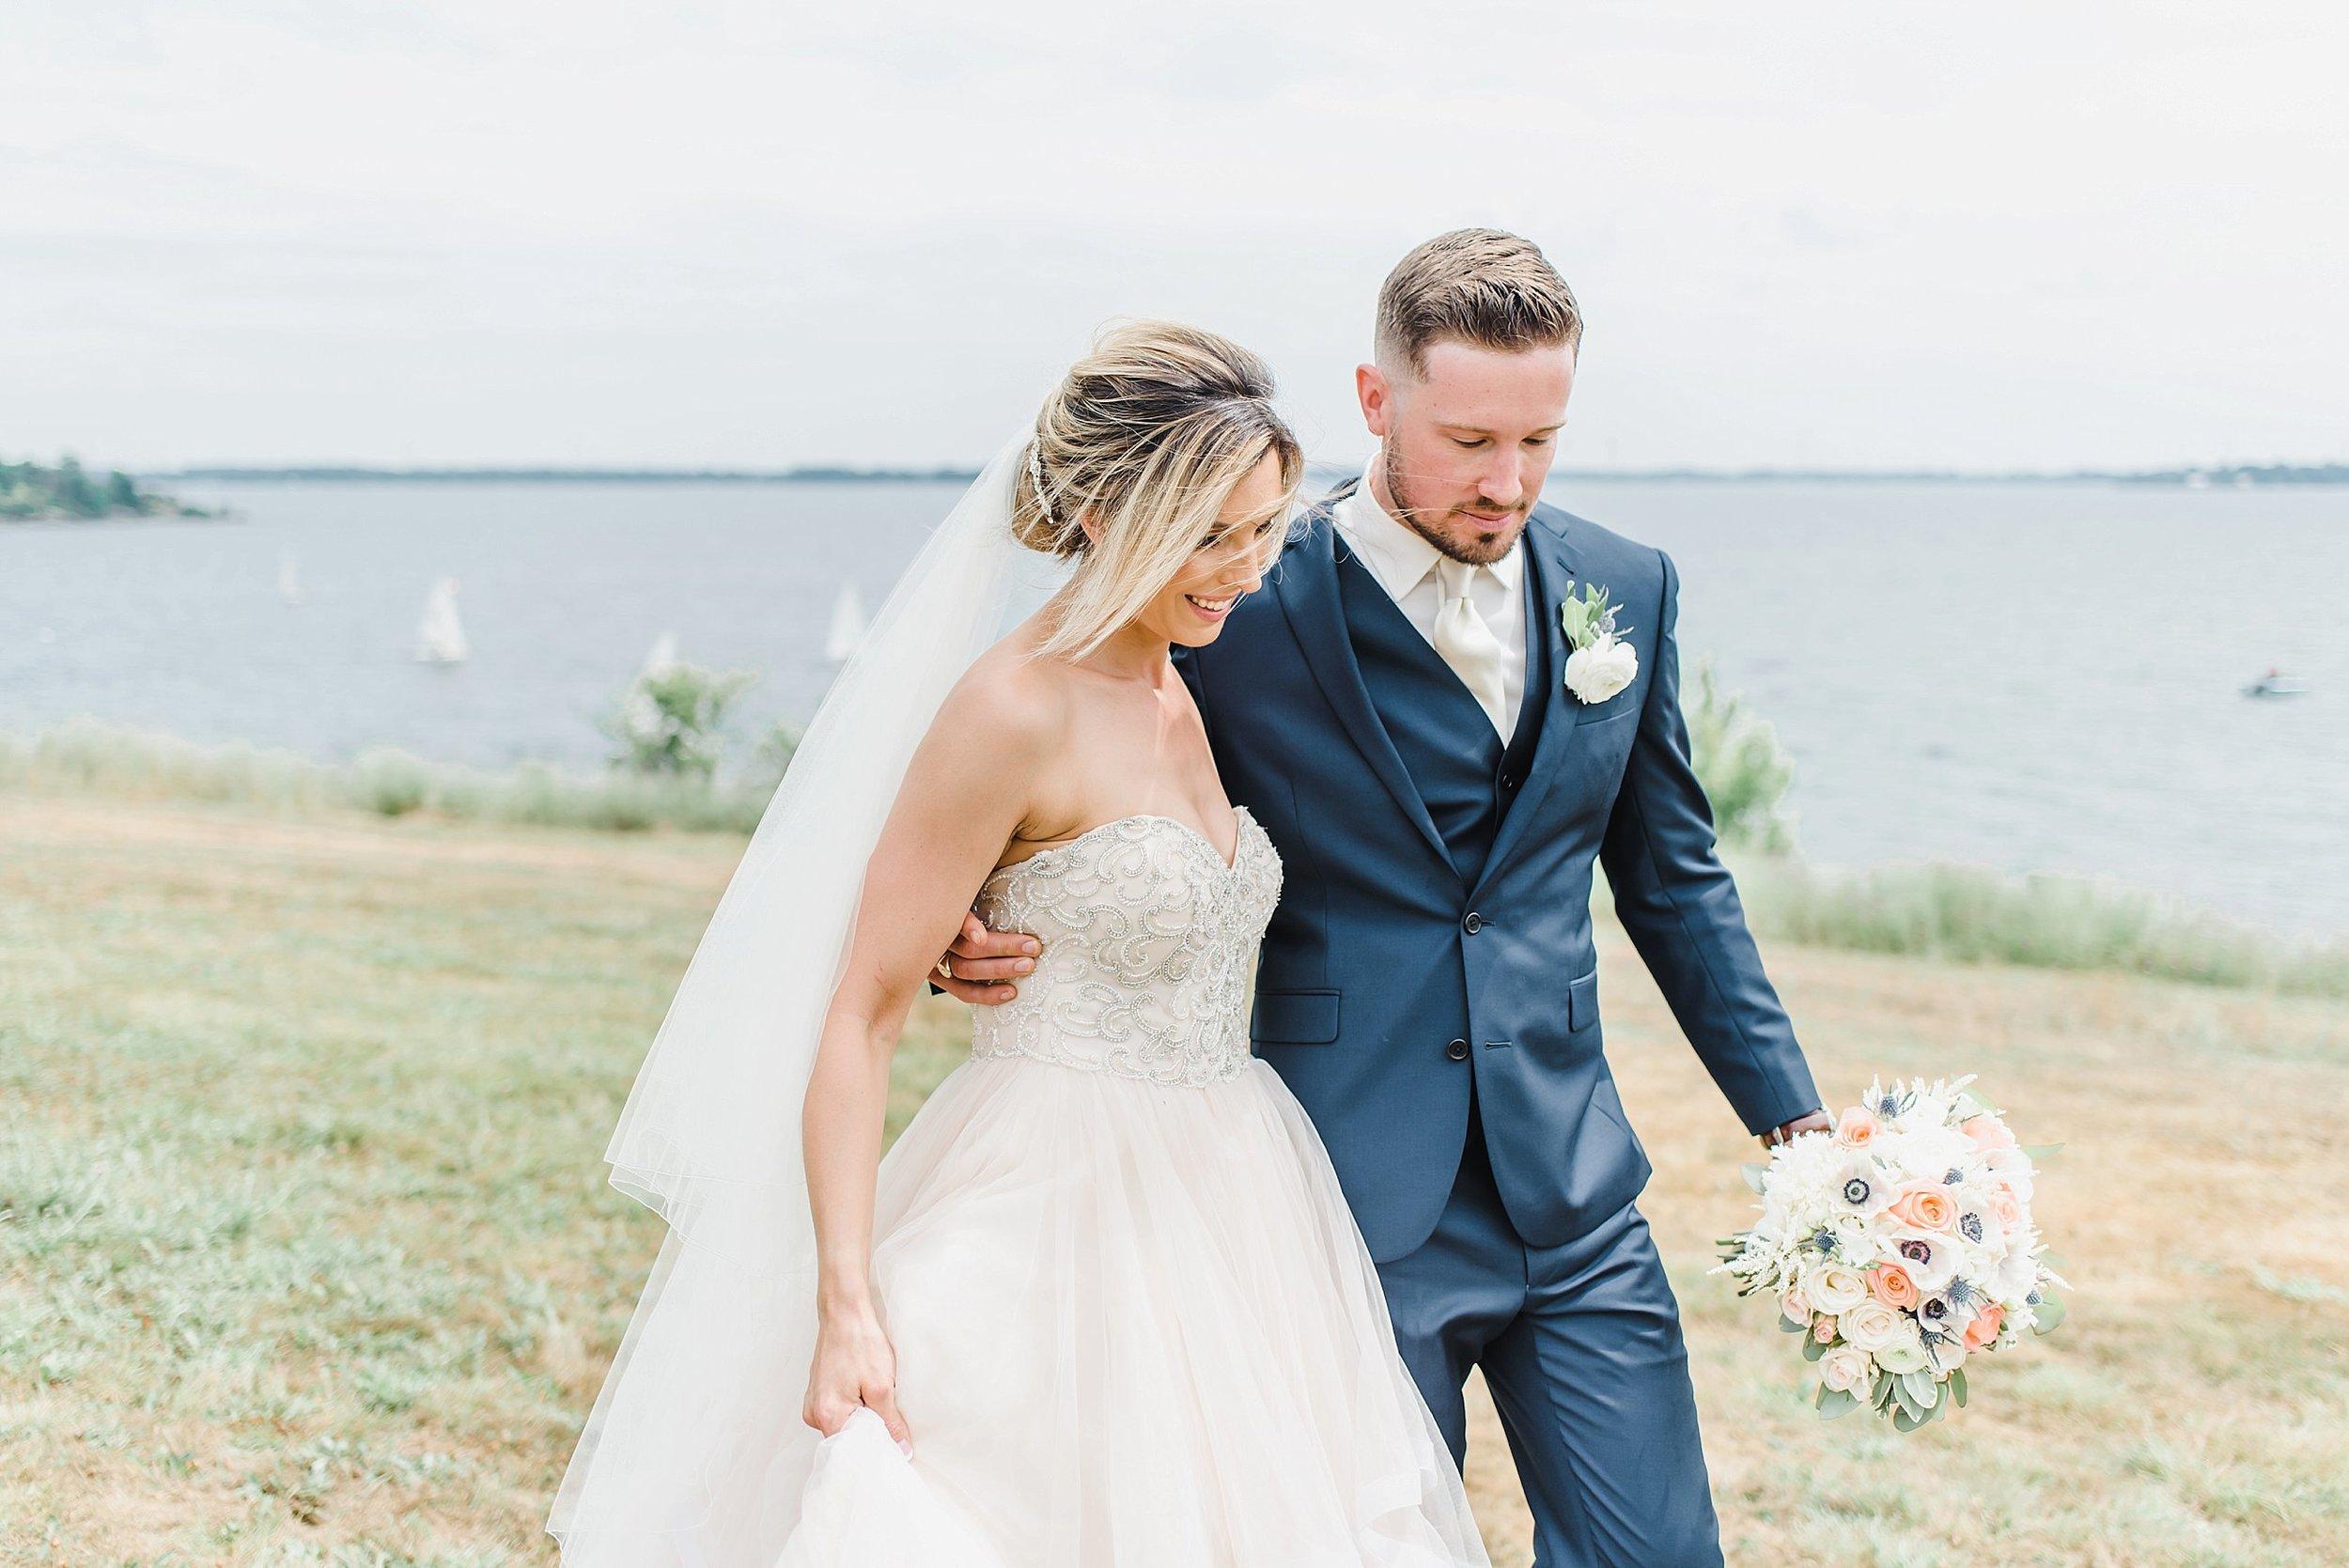 light airy indie fine art ottawa wedding photographer | Ali and Batoul Photography_0159.jpg